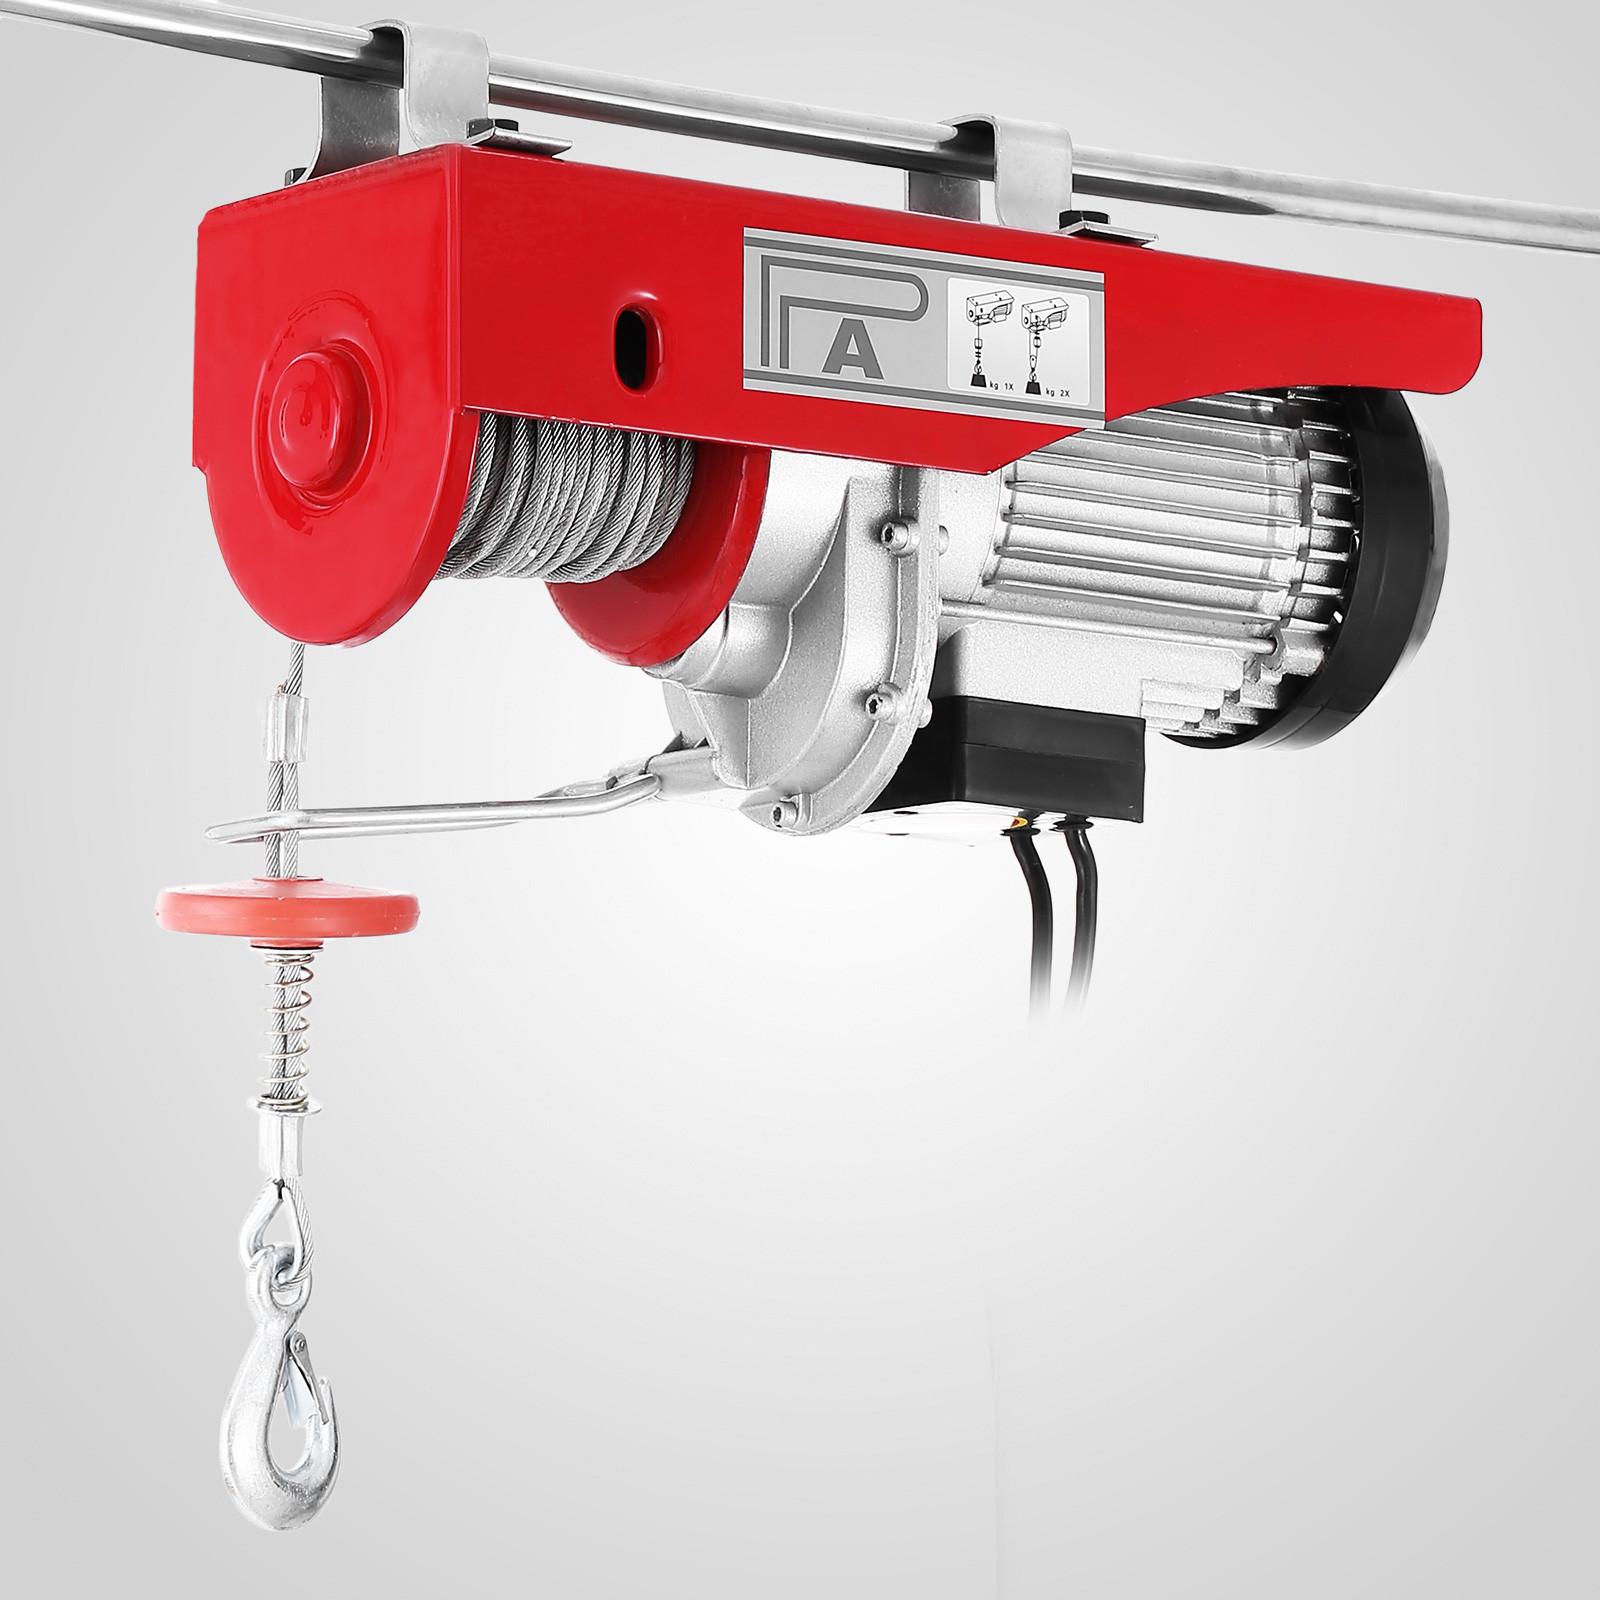 100kg-900kg-Electric-Hoist-Winch-Lifting-Engine-Crane-Cable-Lift-Hook-Garage miniature 30